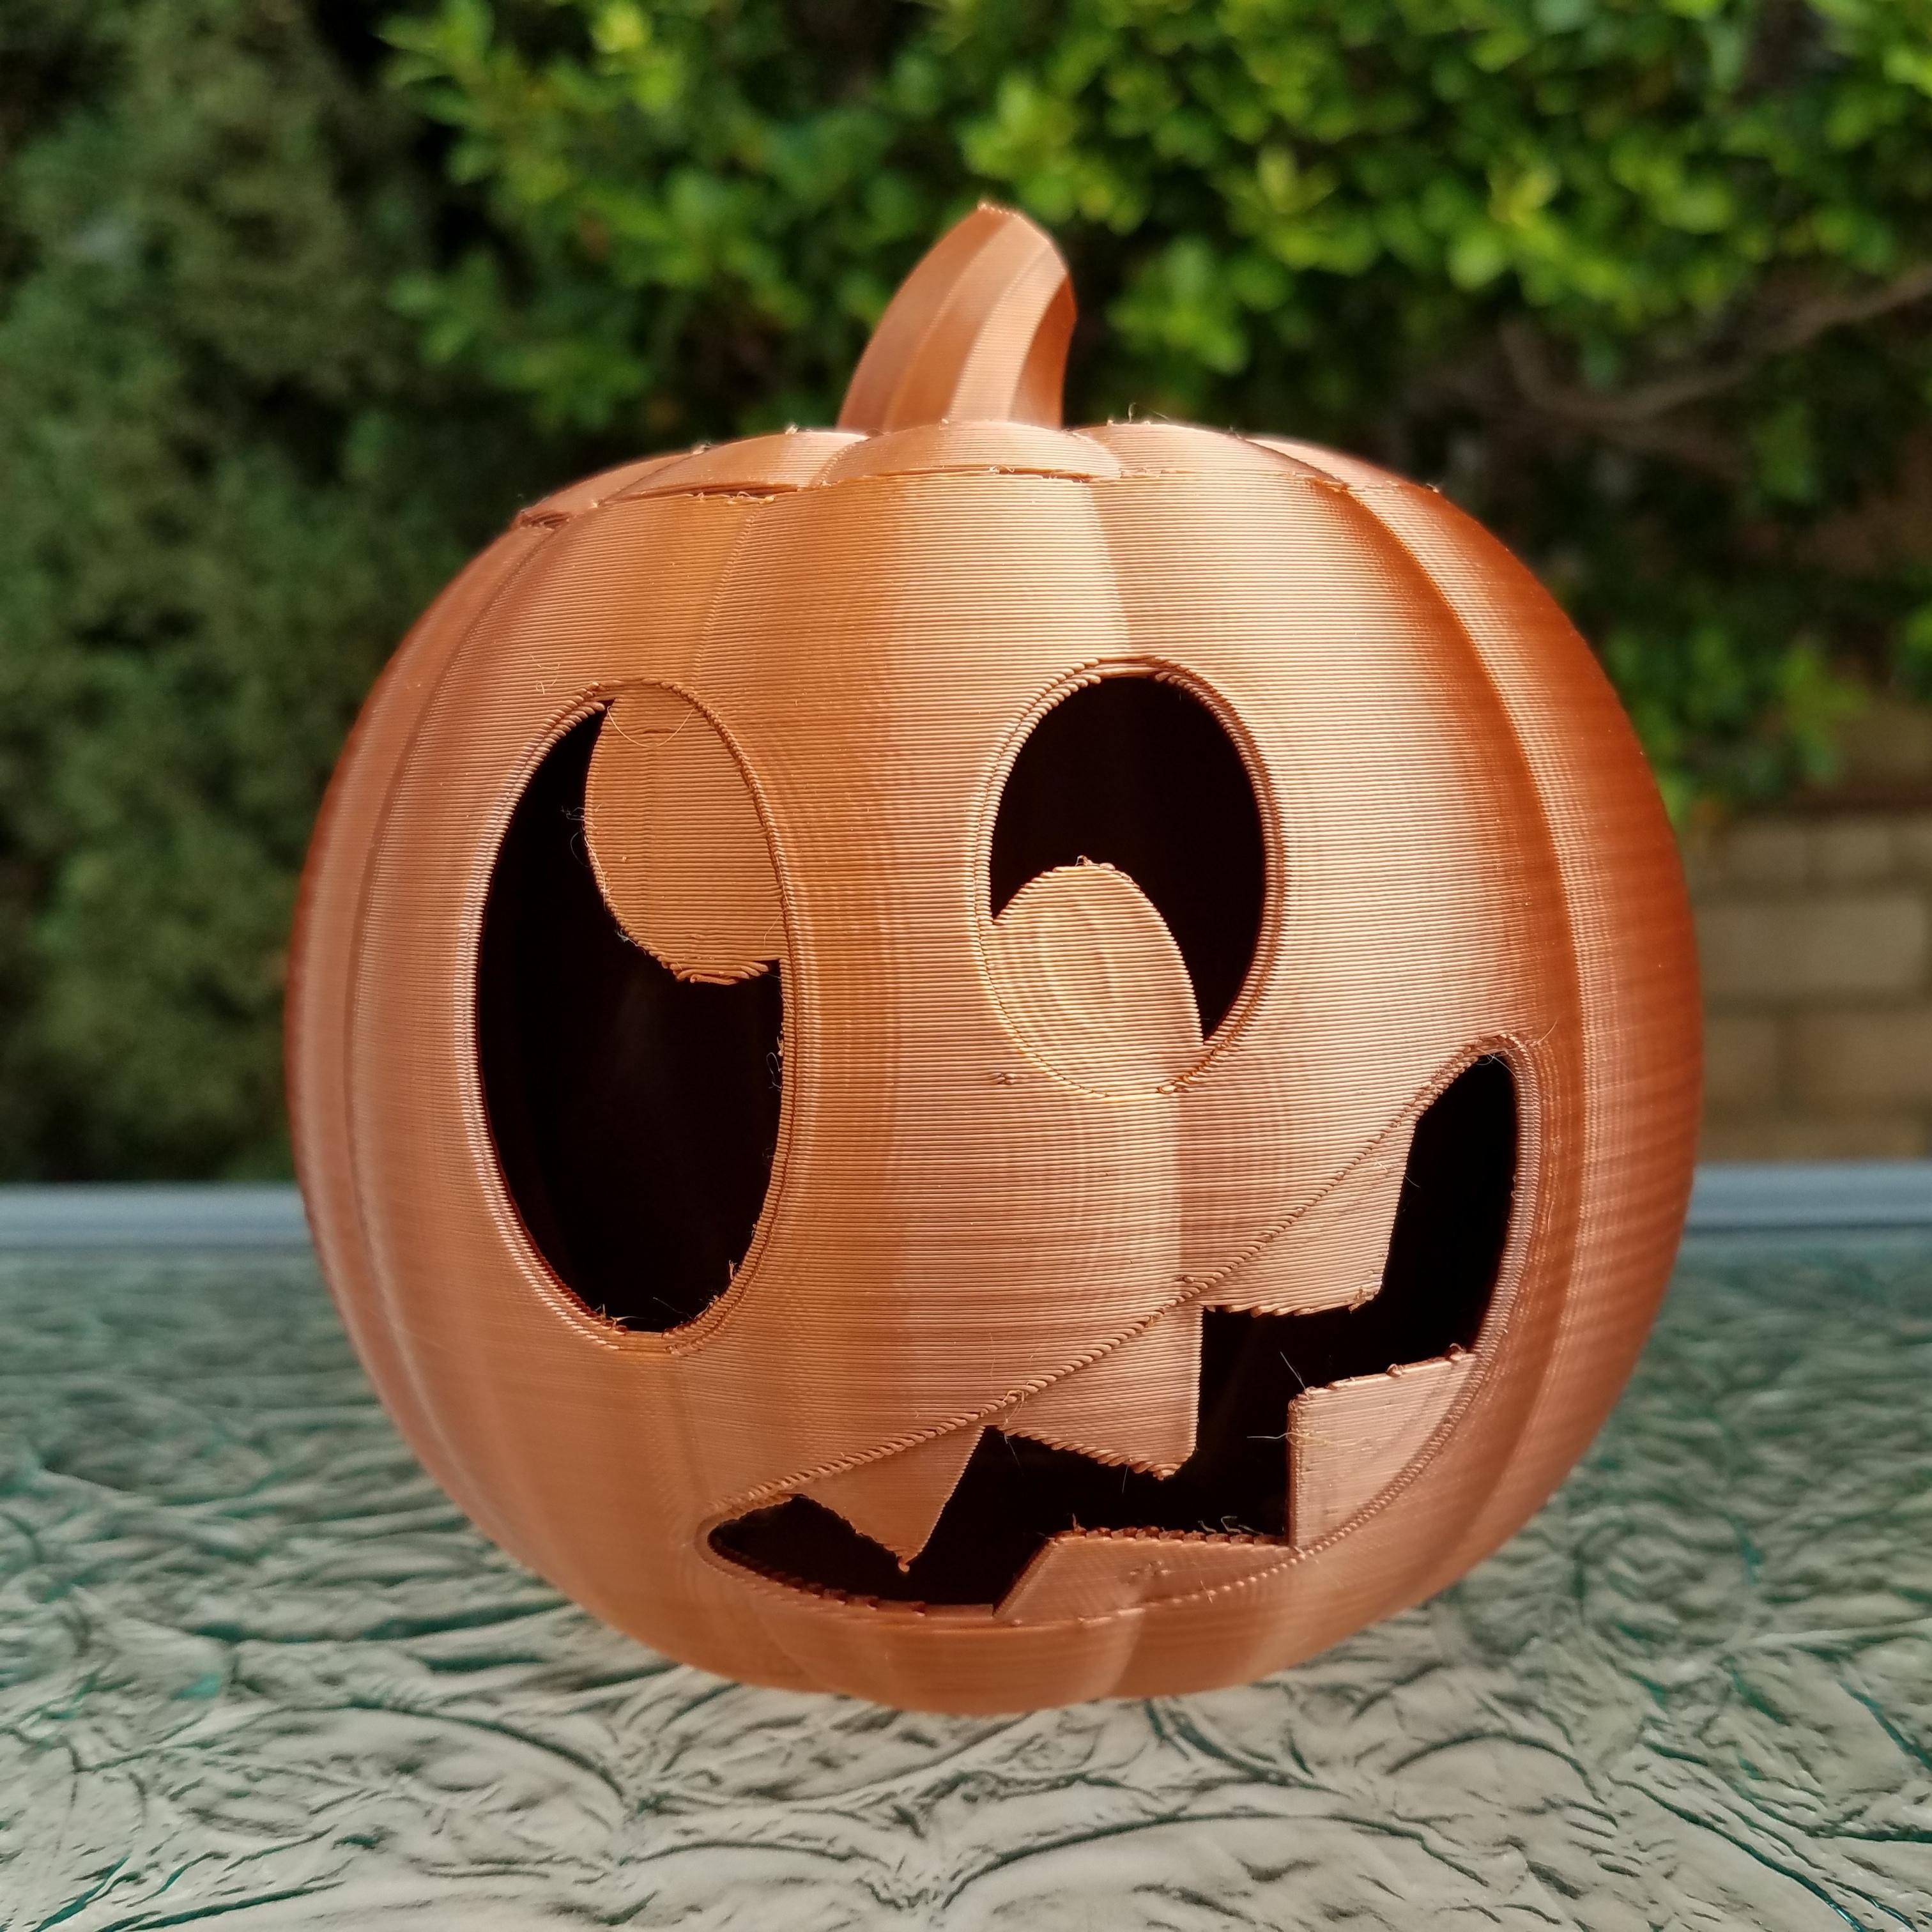 20201022_101529.jpg Download STL file Jack-O'-Lantern Silly Monster • 3D printing model, abbymath